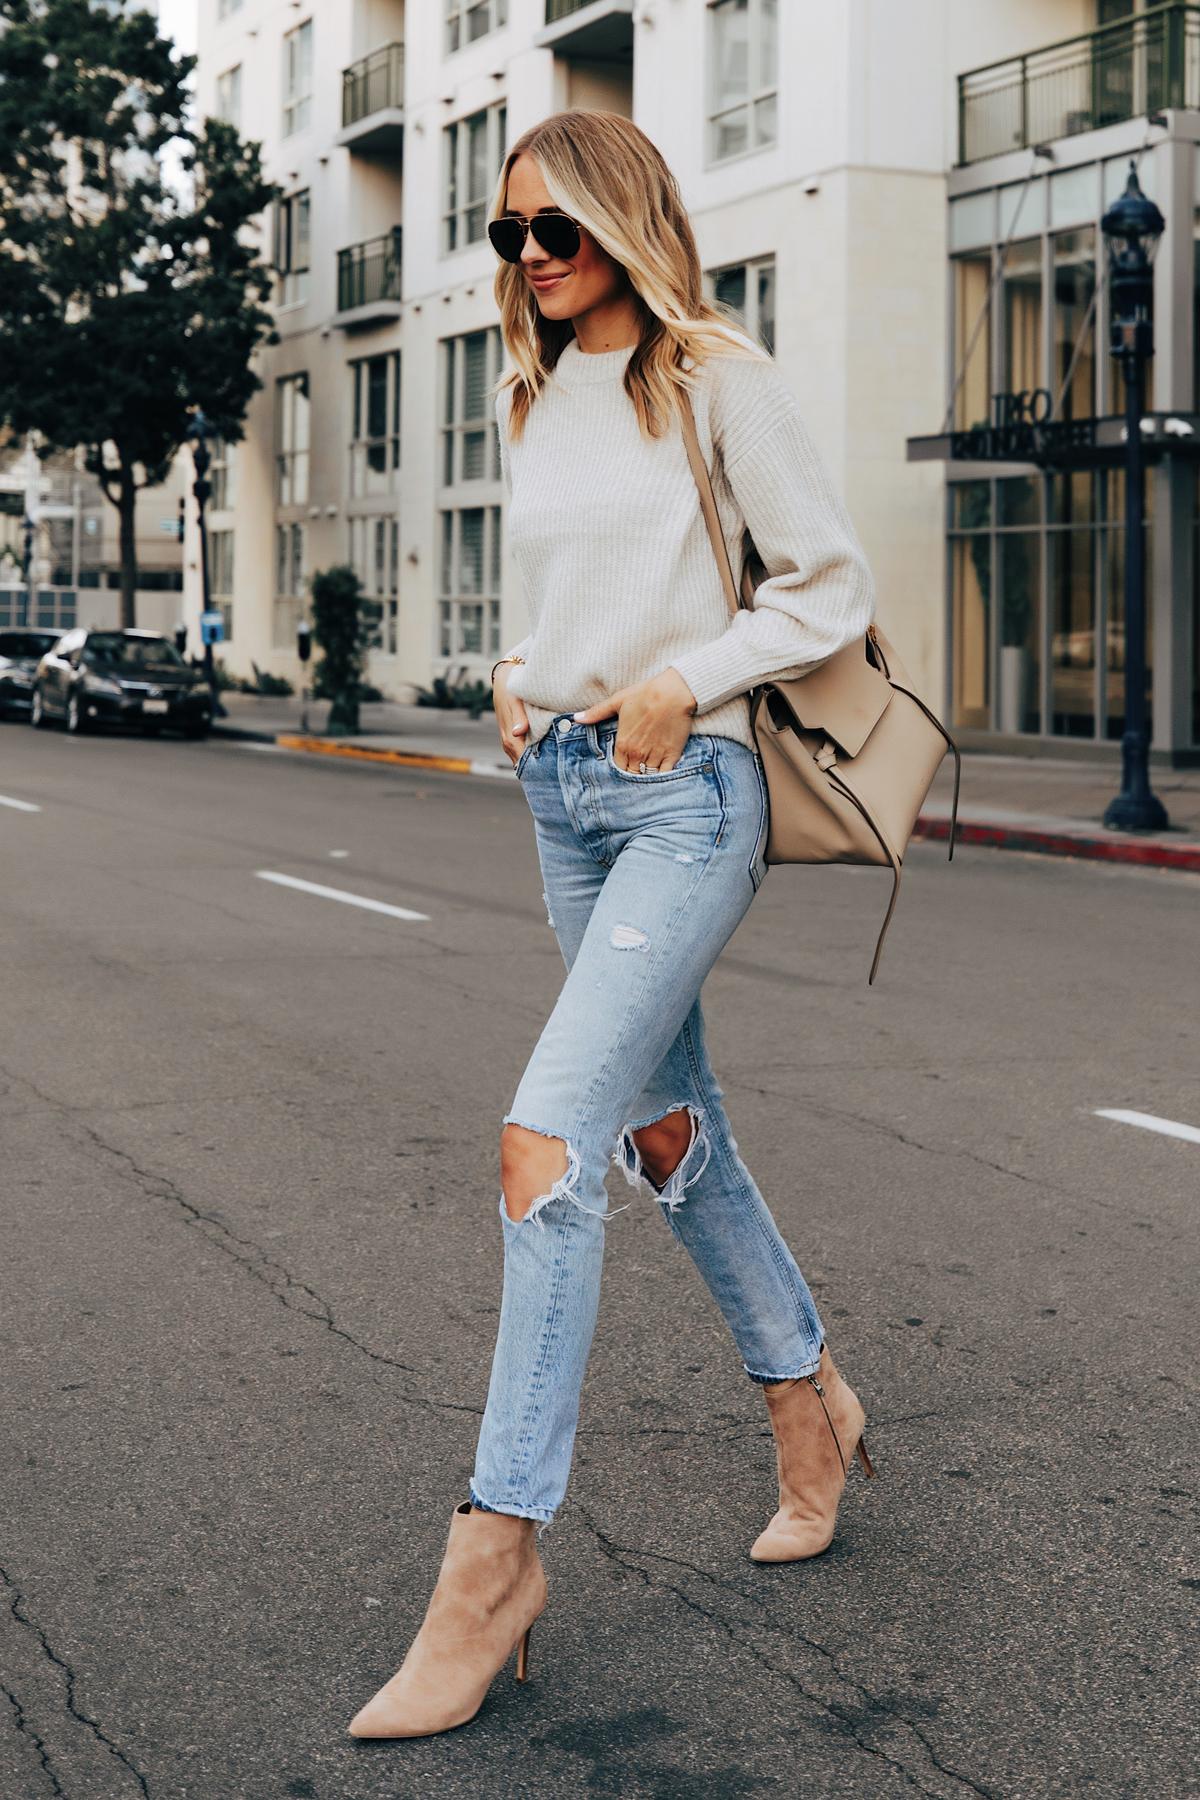 Fashion Jackson Wearing Everlane Beige Sweater Boyish Ripped Jeans Nine West Tan Suede Stiletto Booties Celine Belt Bag